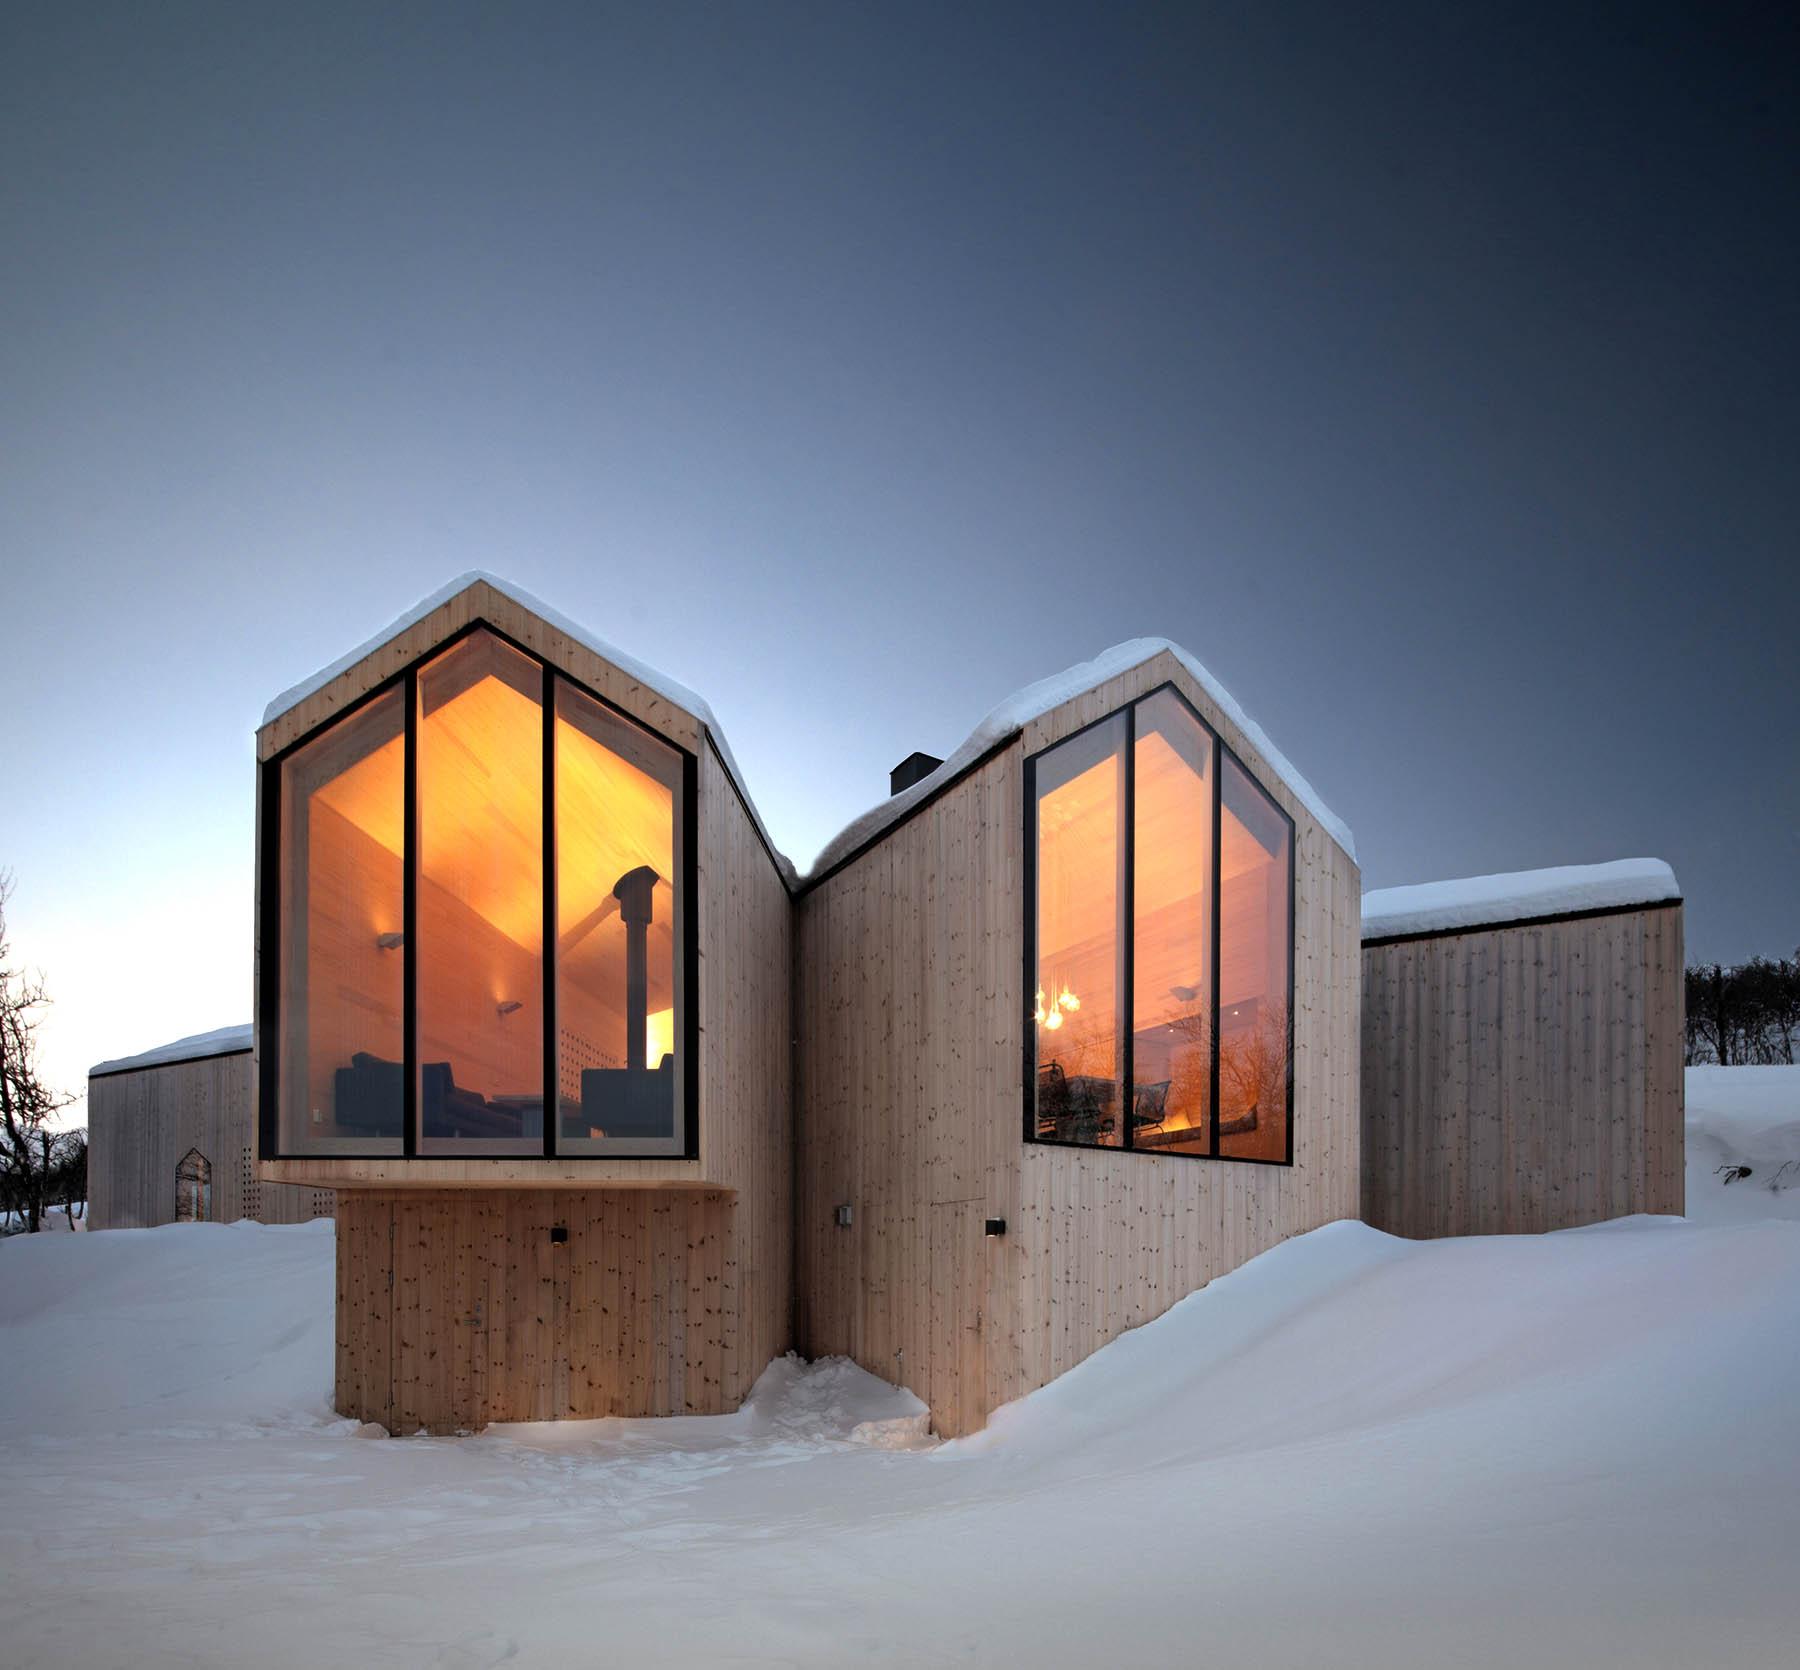 Chalet Design De Luxe A La Montagne Reiulf Ramstad Arkitekte